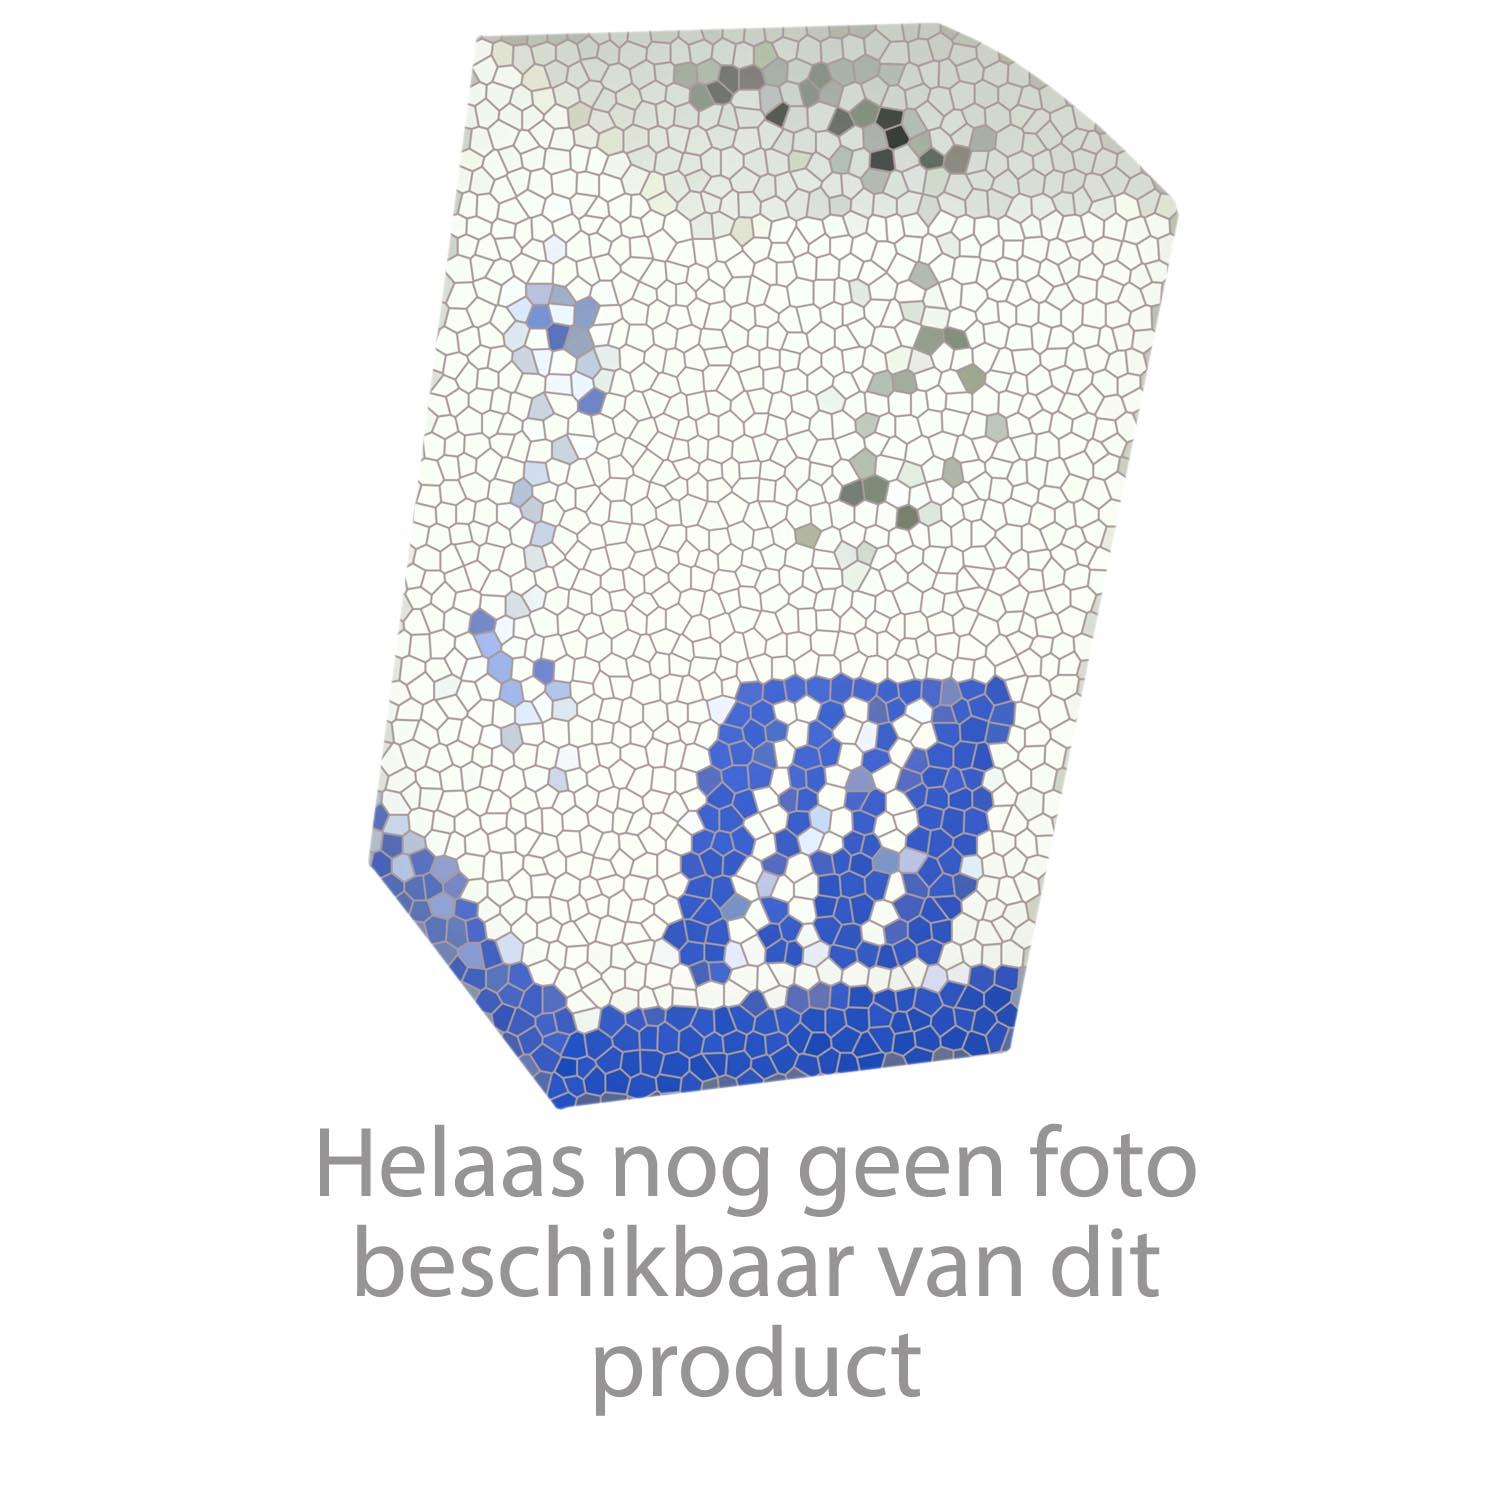 Geberit Gis WC-element H86 met reservoir UP200 planchet- en frontbediening